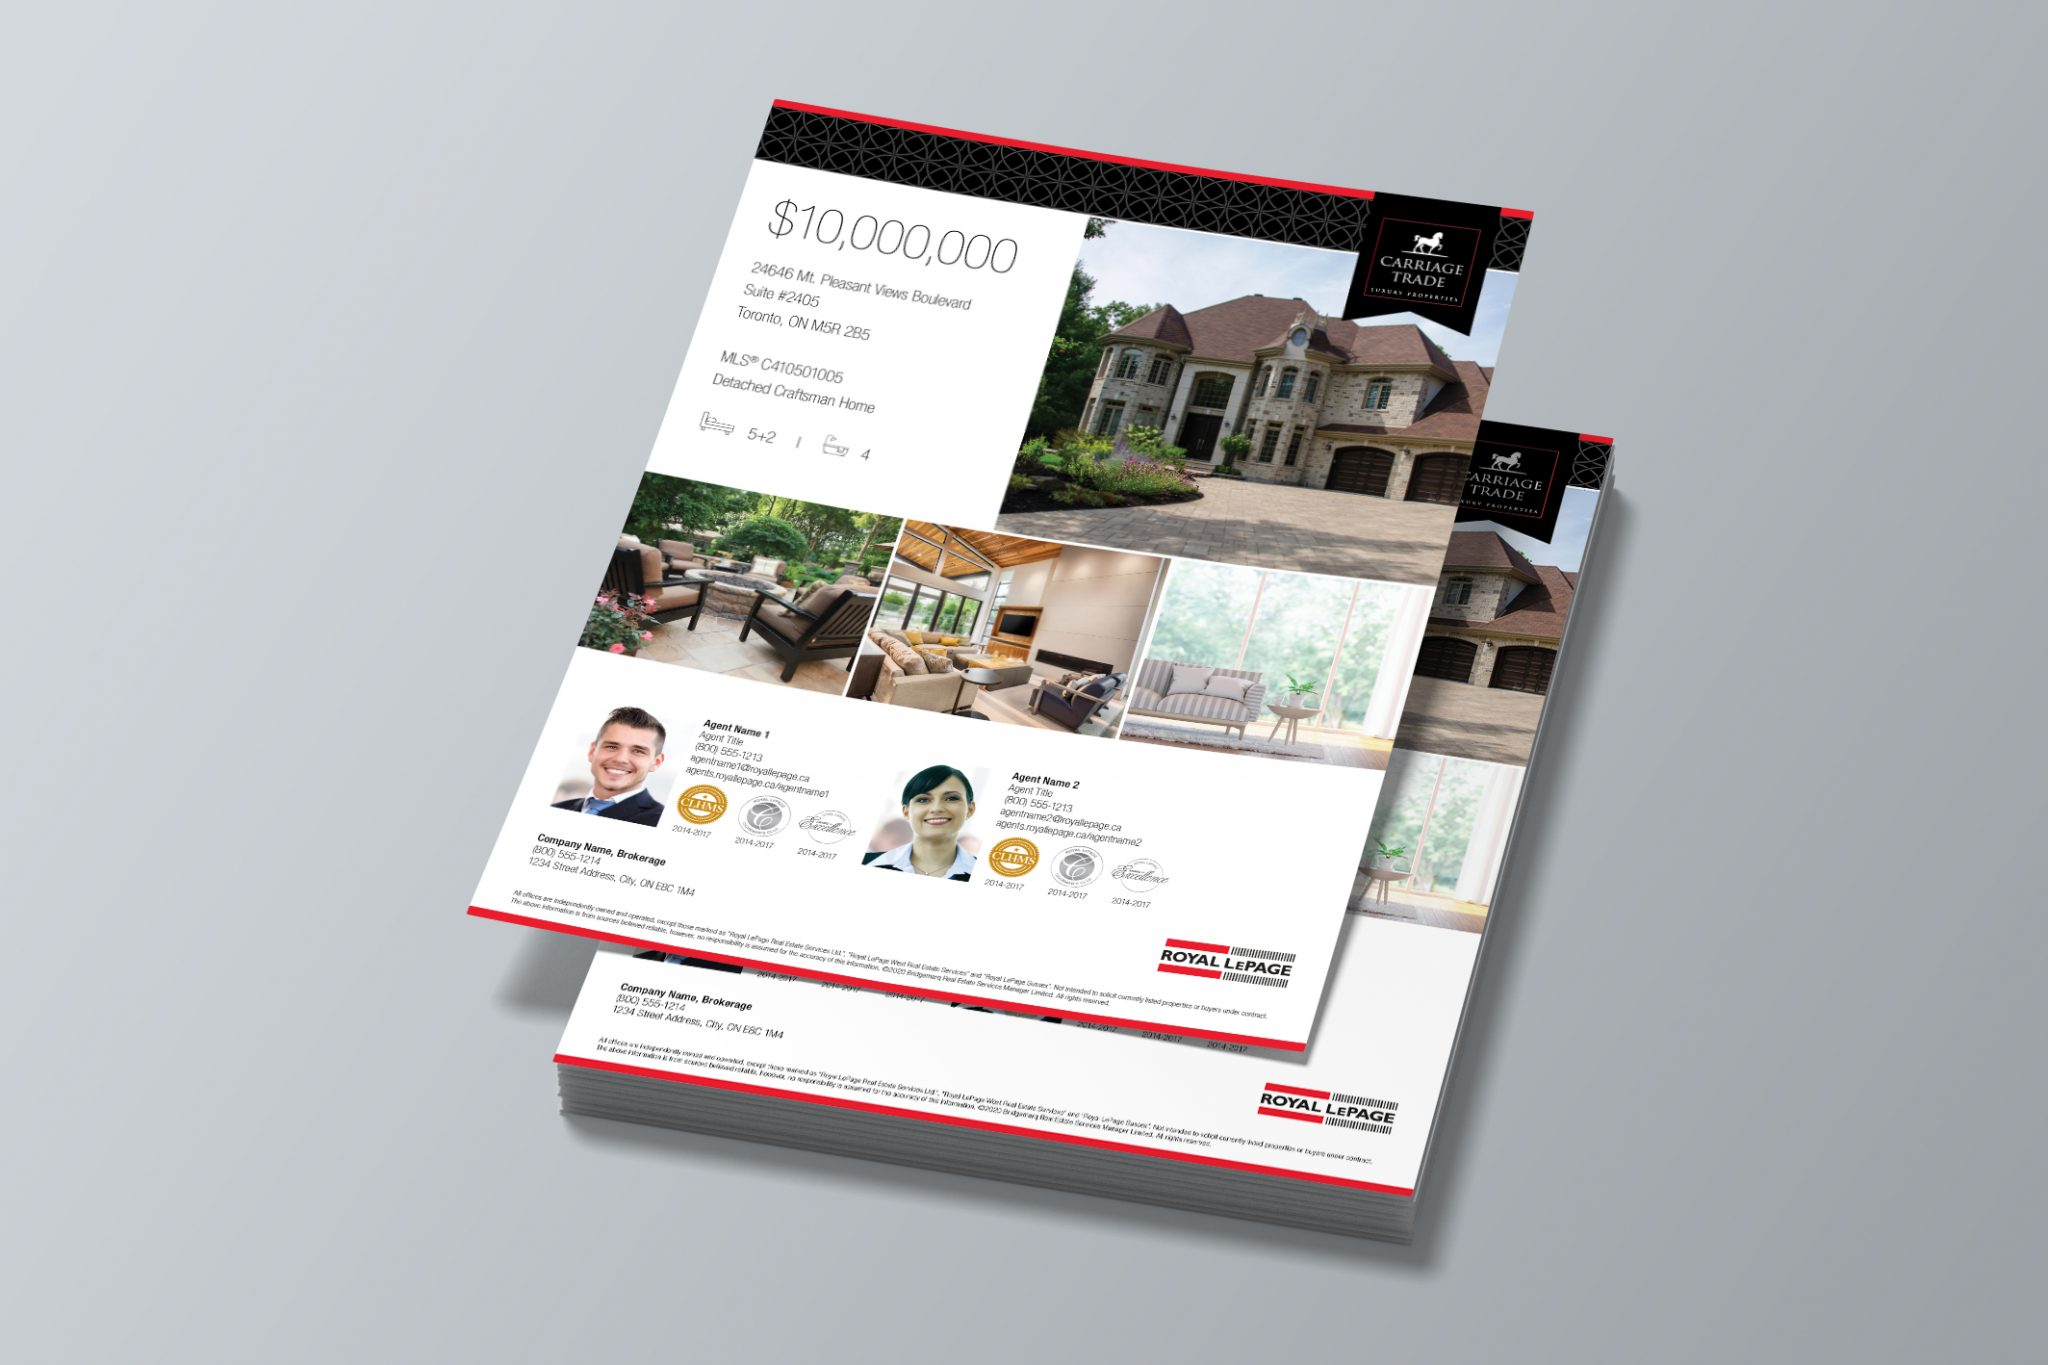 carriage-trade-brochure-6